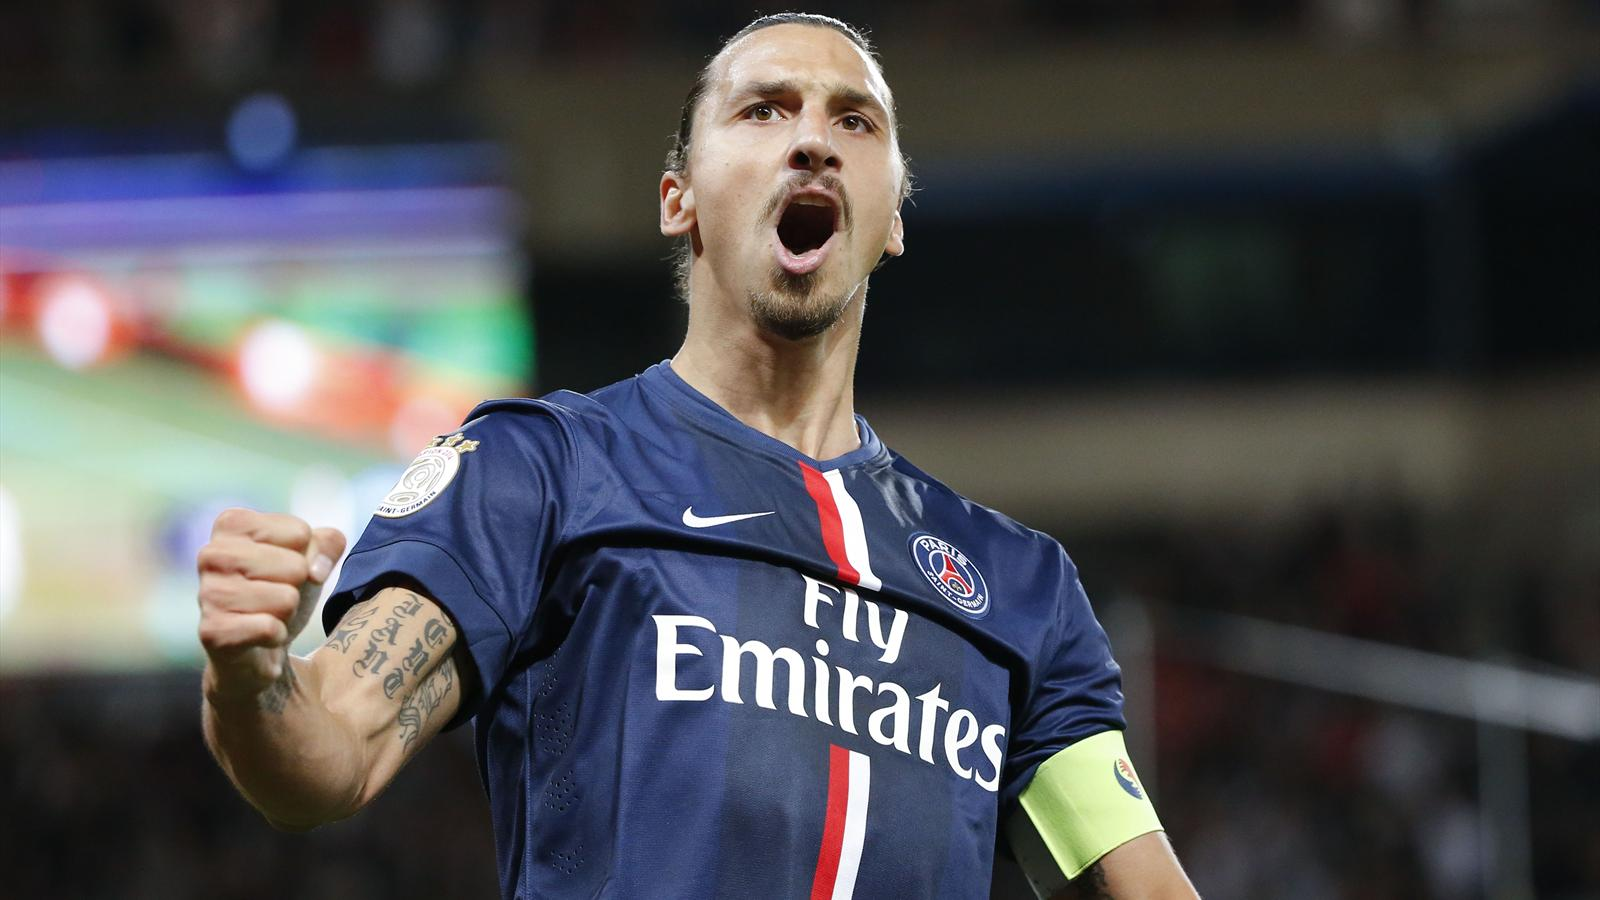 Zlatan Ibrahimovic: una leggenda in tutti i sensi